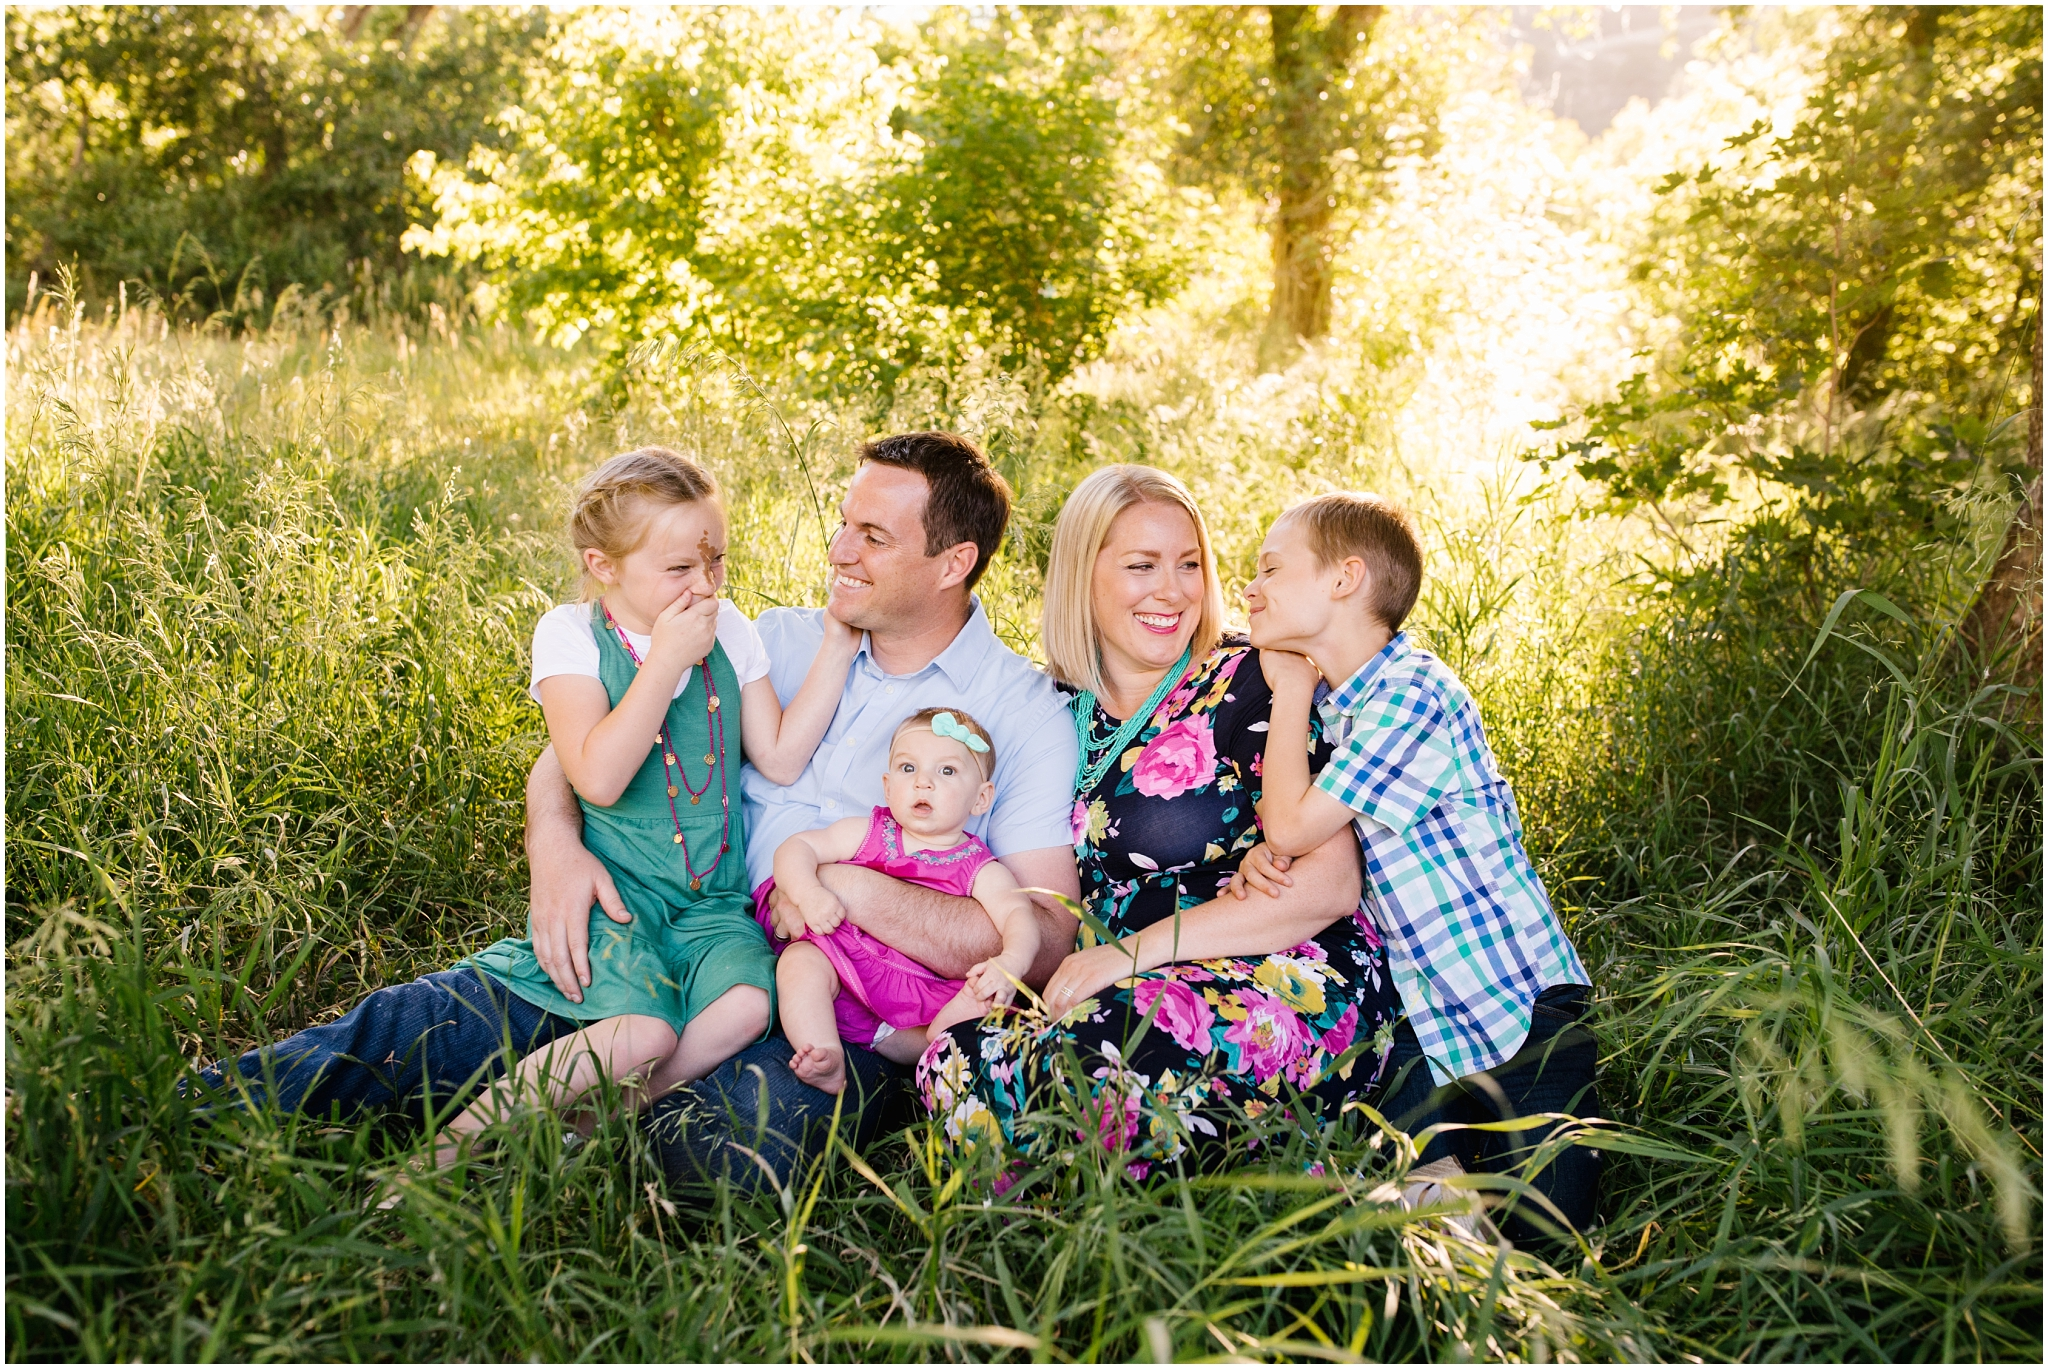 Lizzie-B-Imagery-Utah-Family-Photographer-Utah-County-Photographer-Hobble-Creek-Canyon_0030.jpg